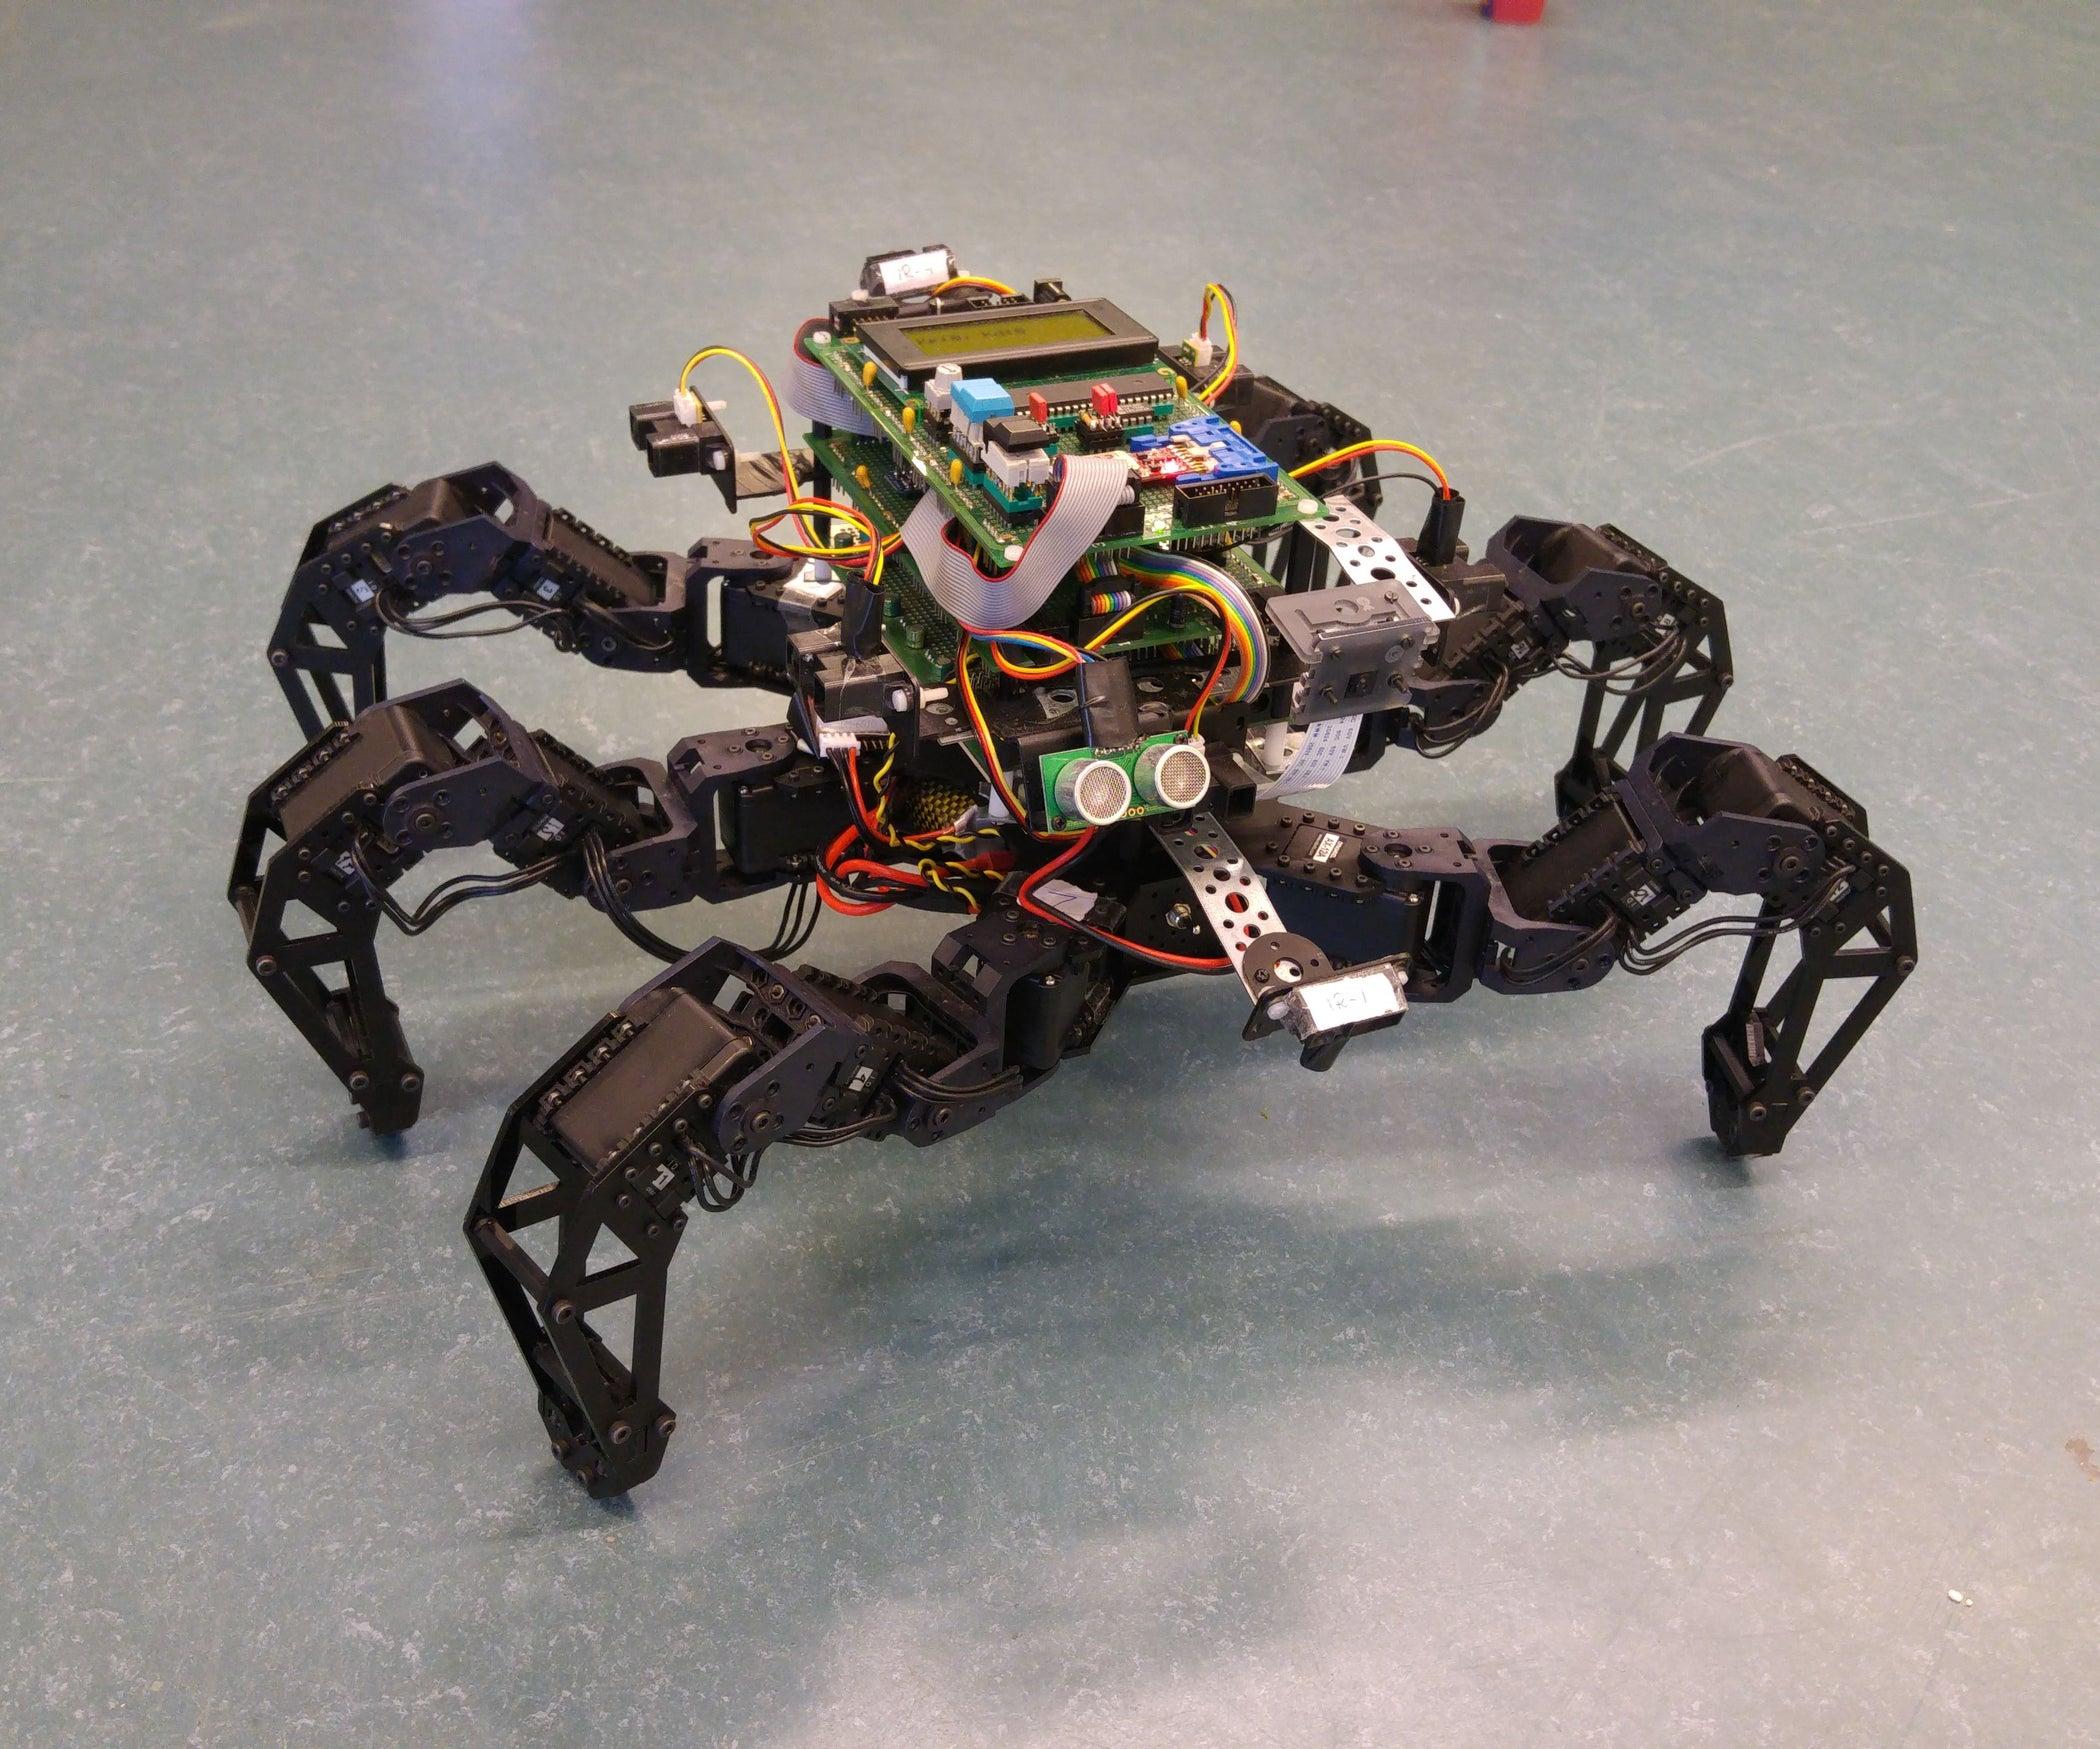 Spider Pig Autonomous Hexapod Robot With Pictures